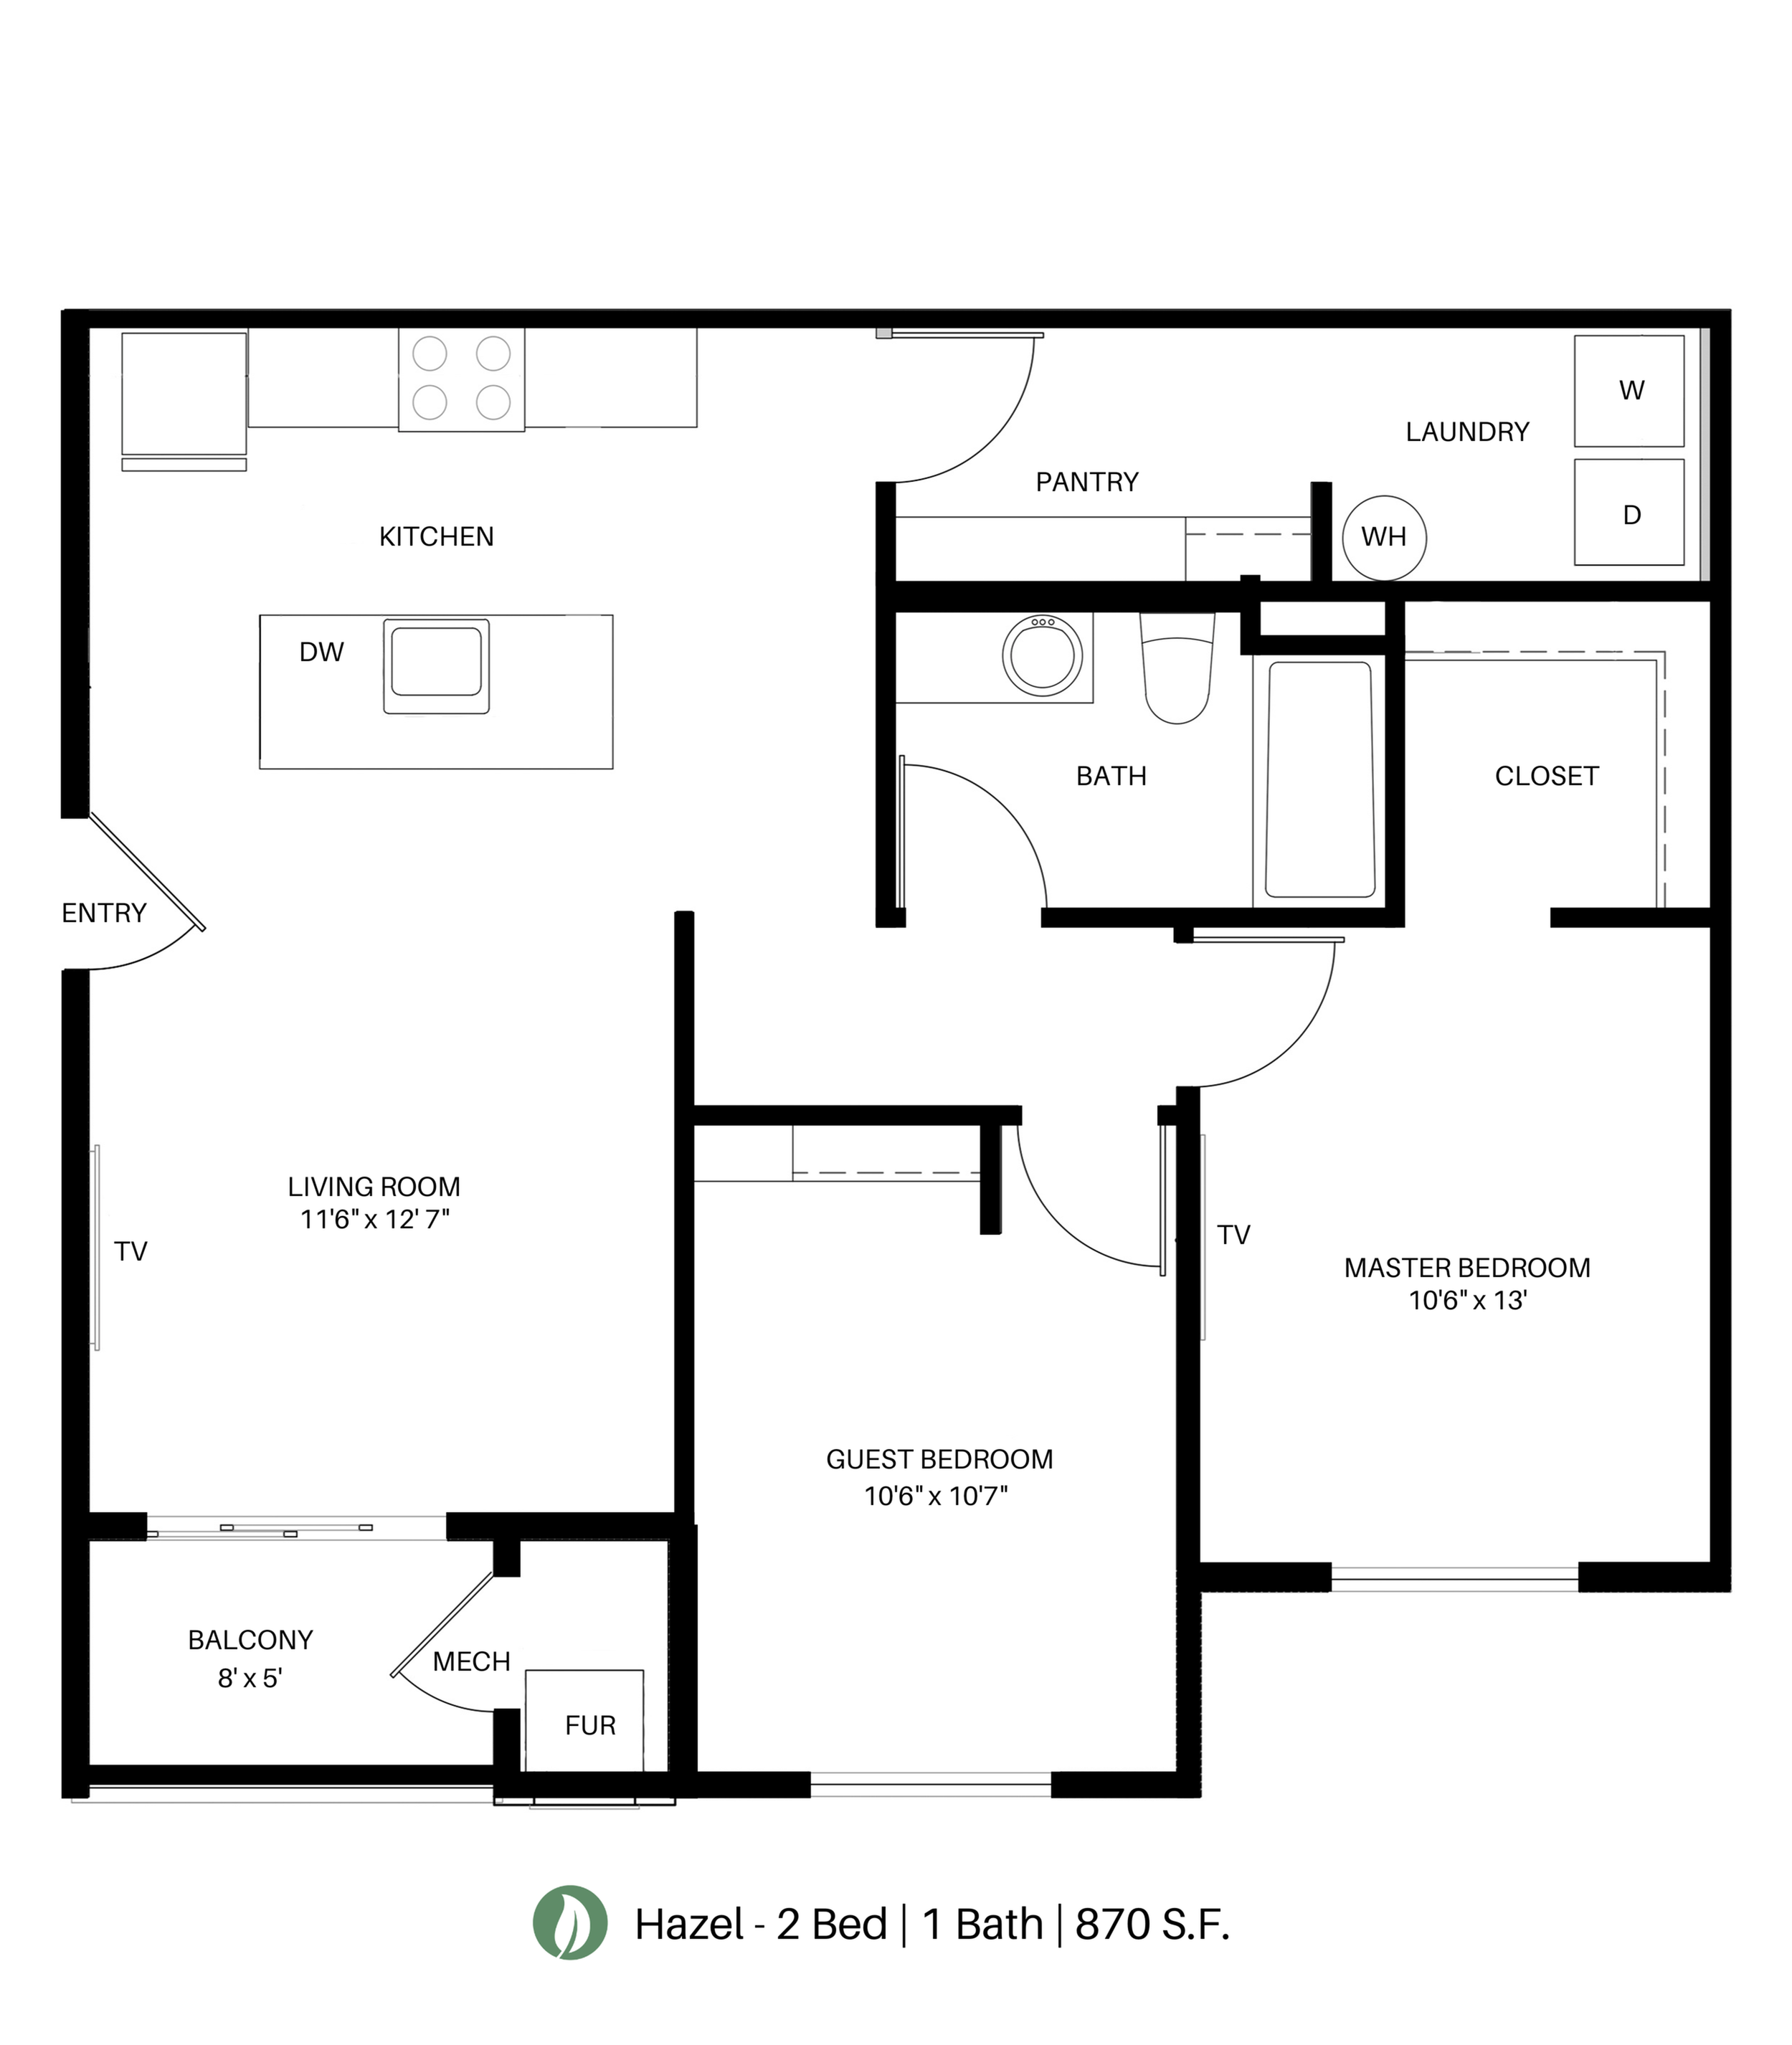 The Hazel Floor Plan Layout